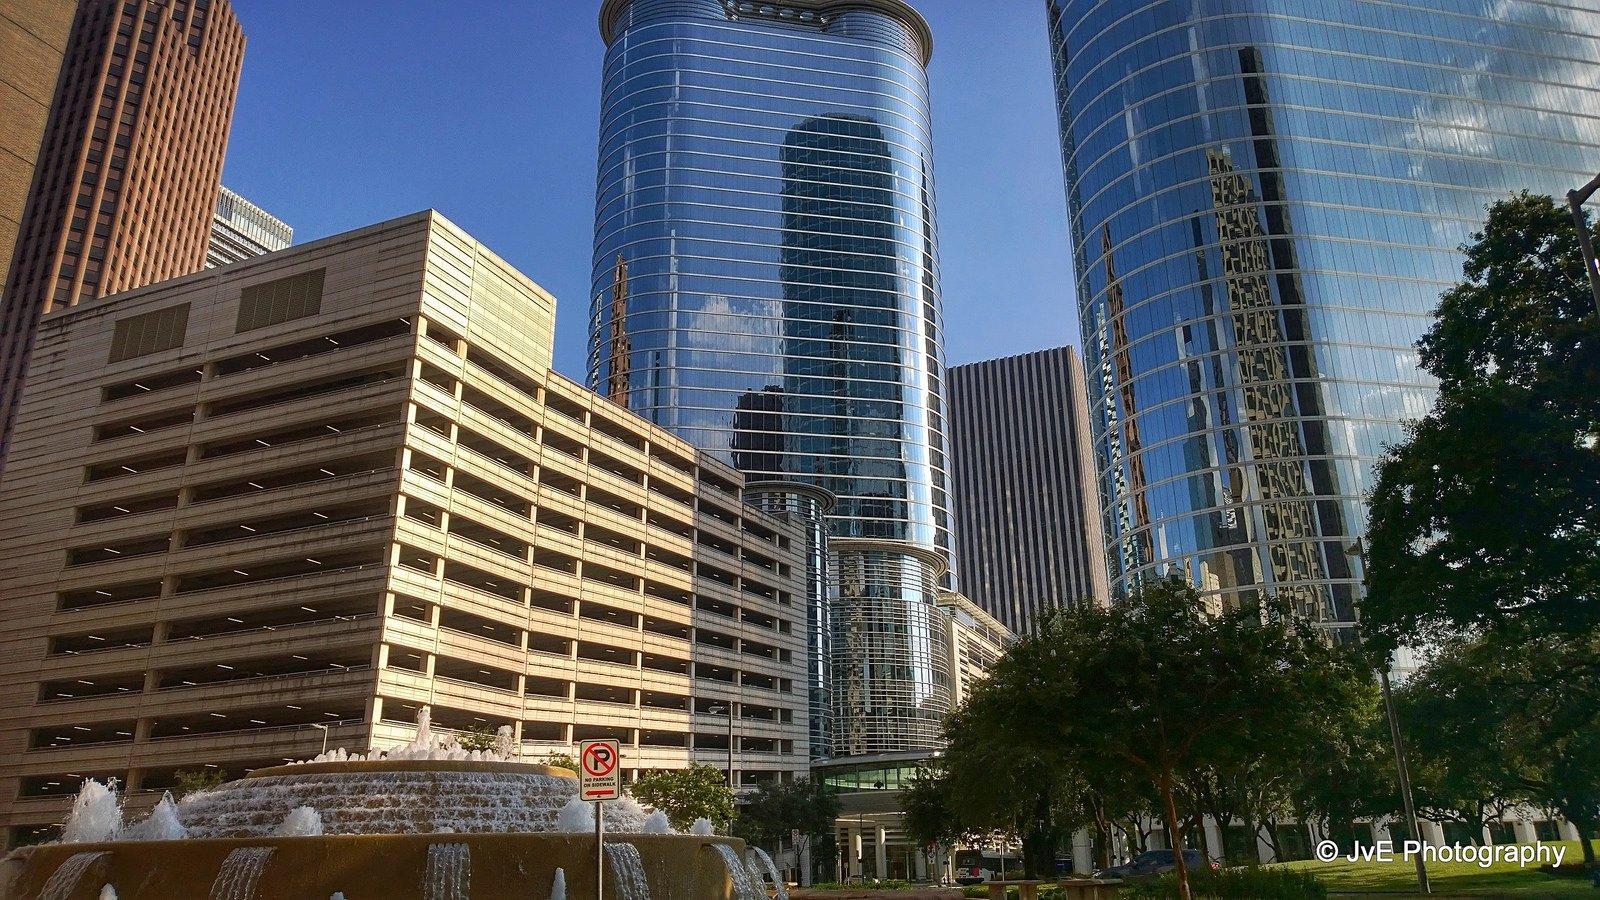 Houston architecture bridges cities City texas Night towers buildings 1600x900